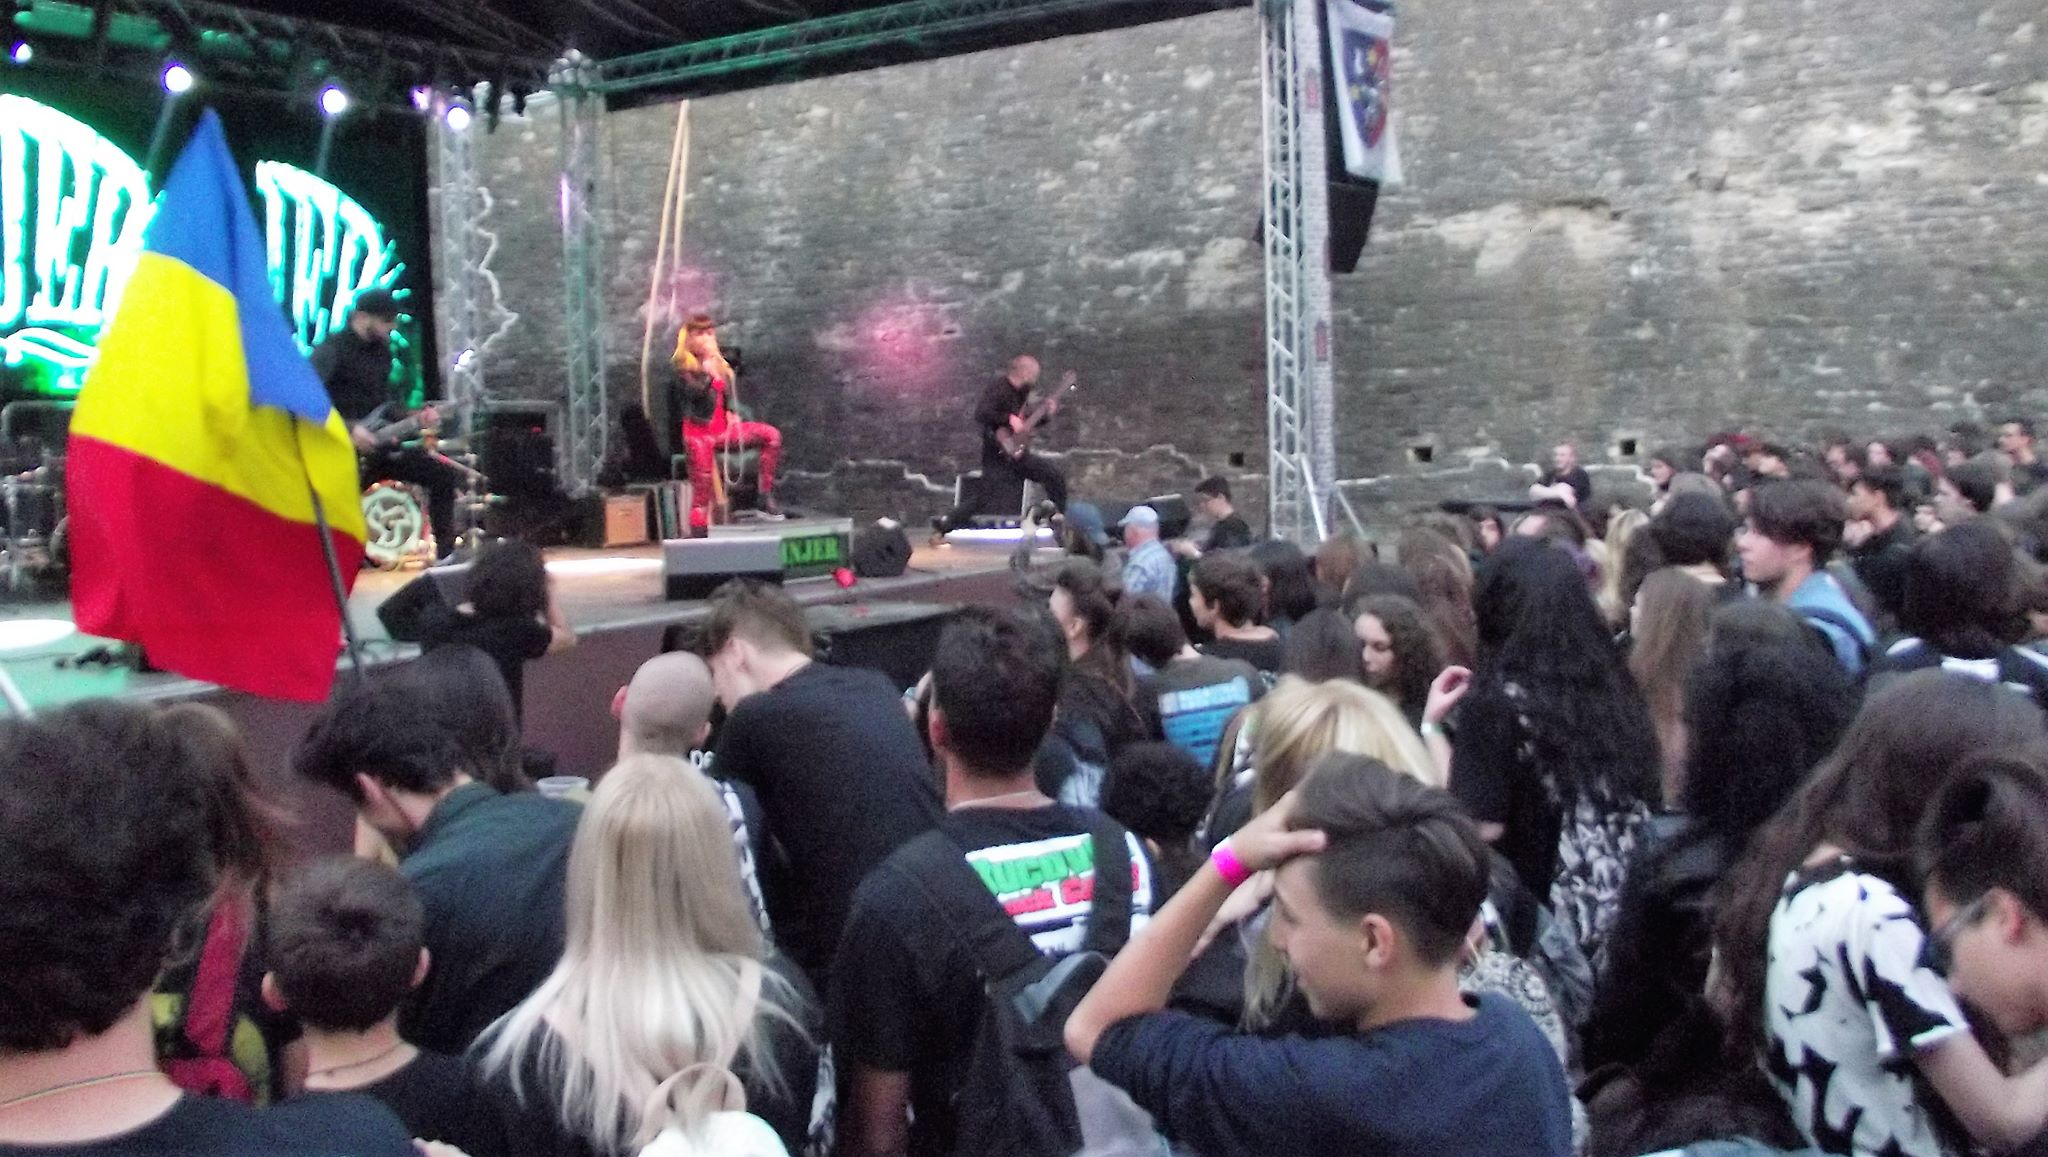 Coso rock 6